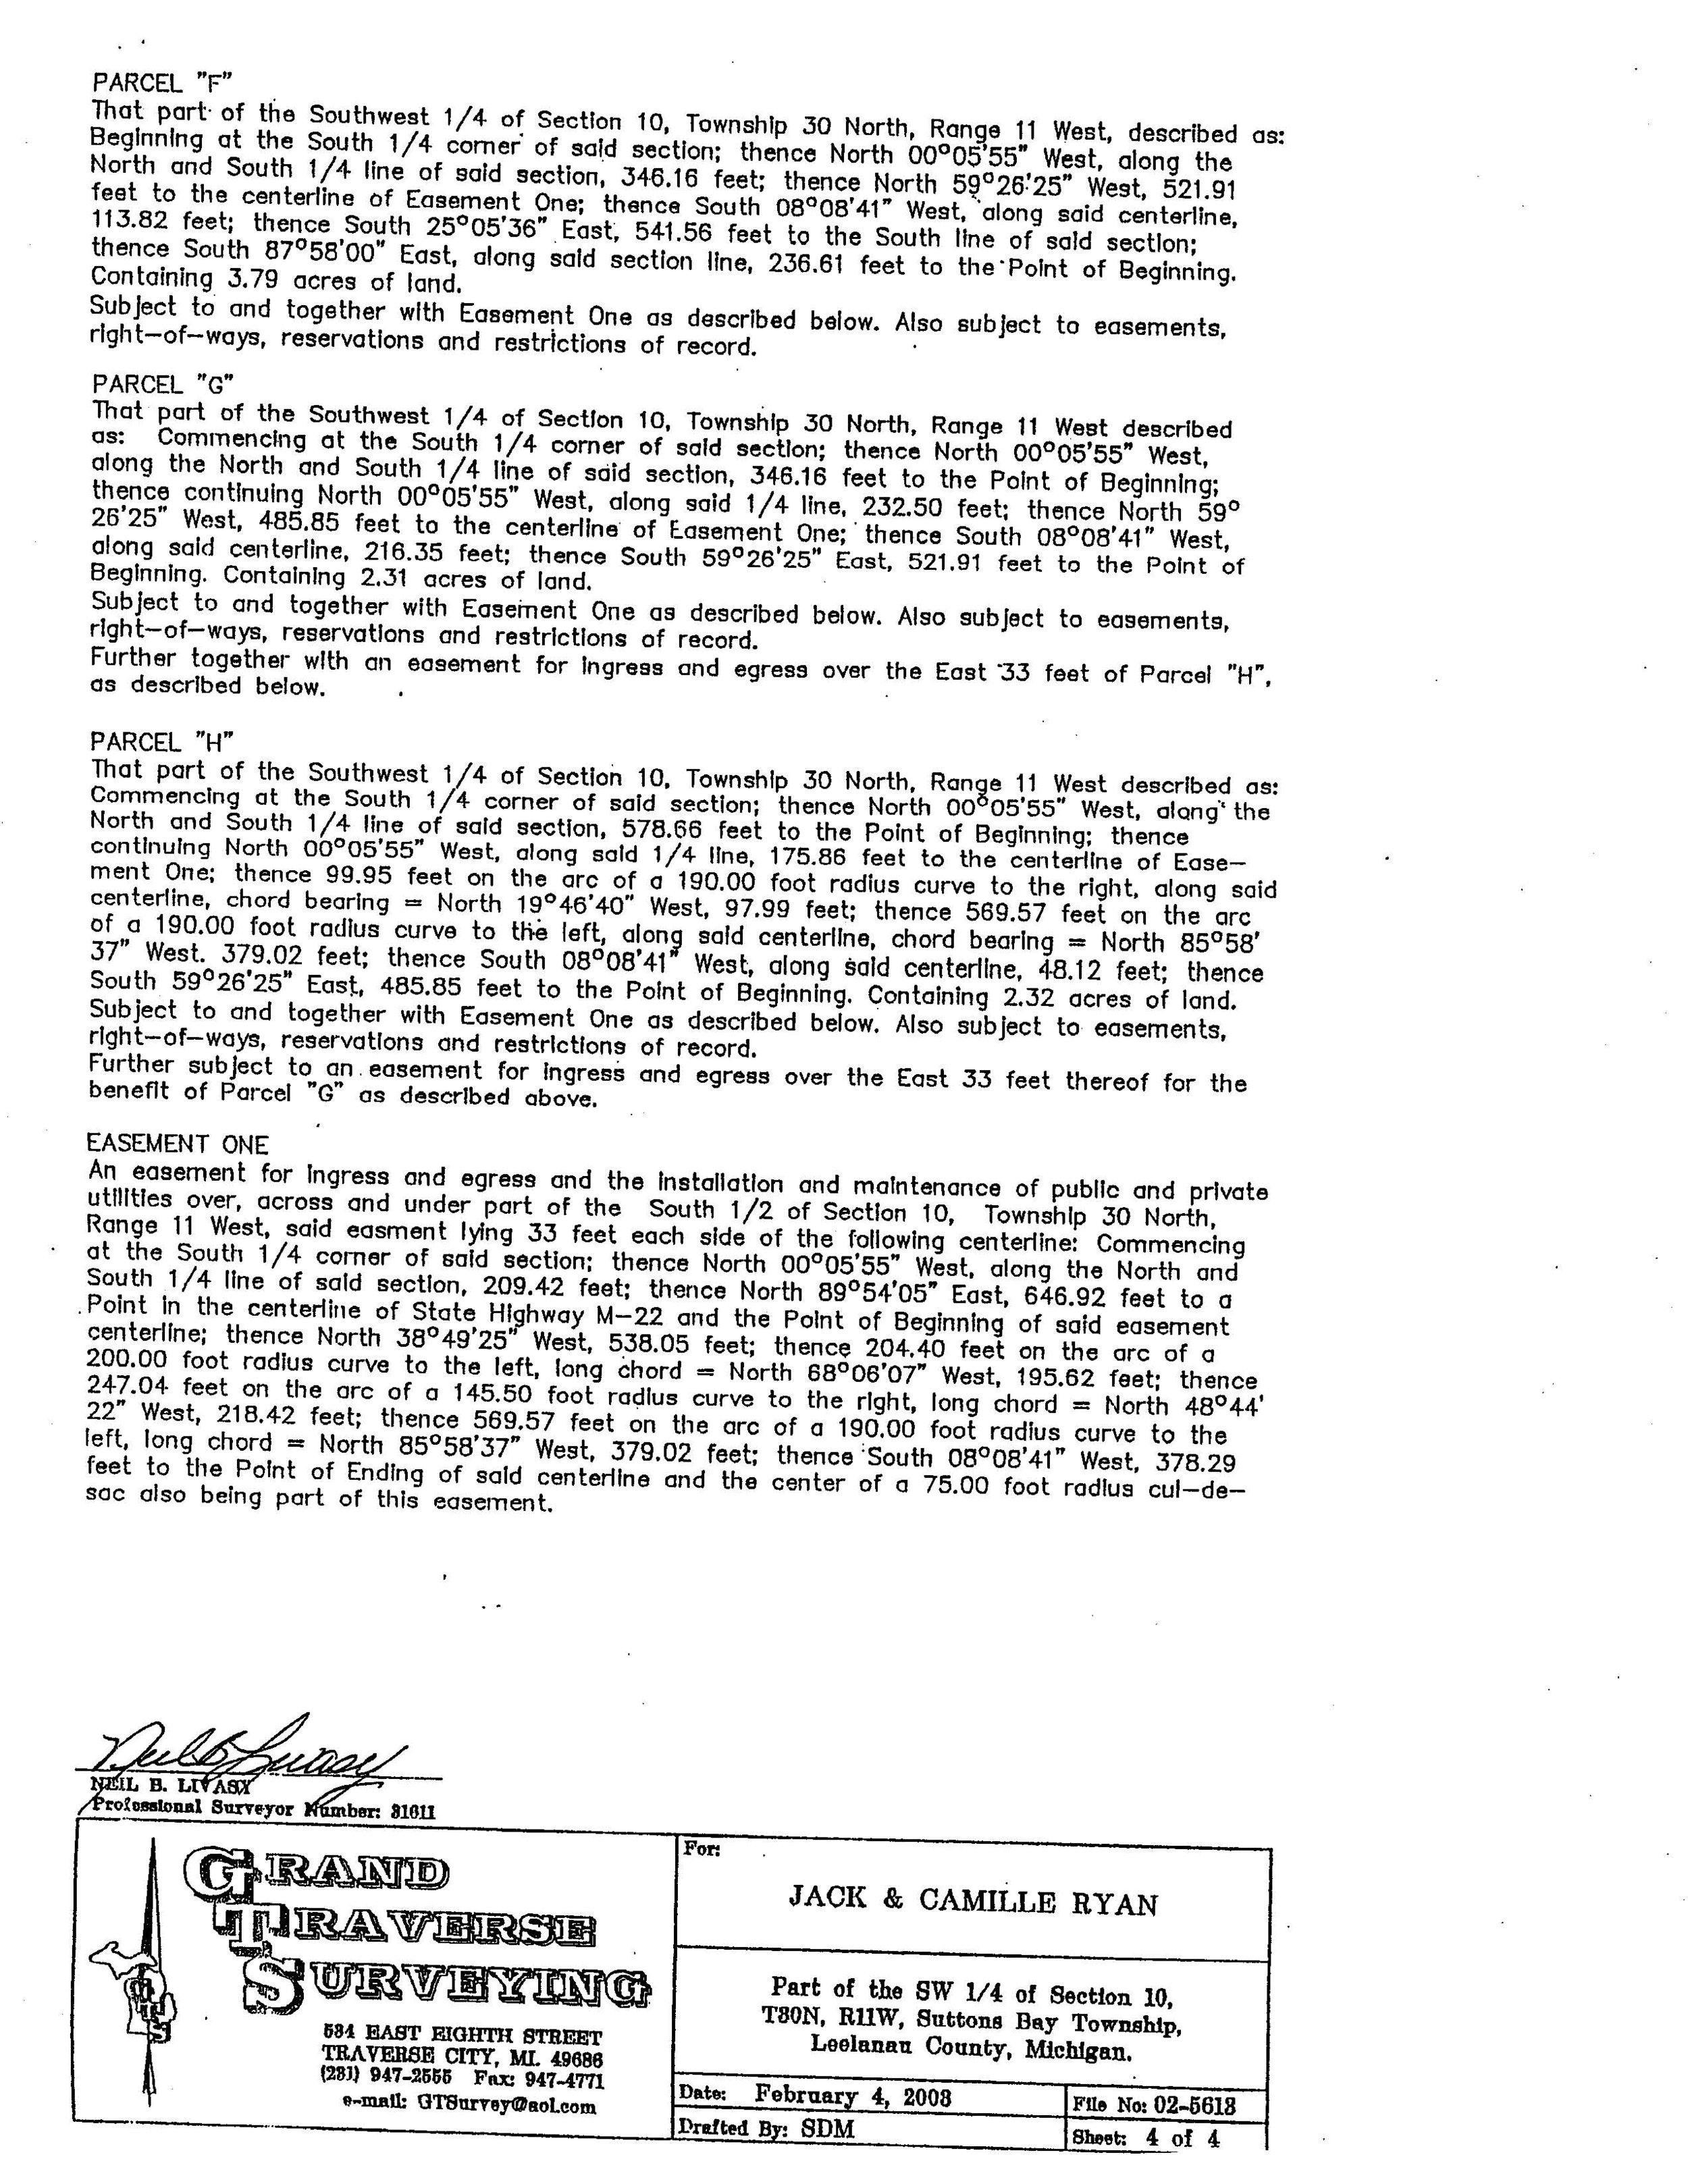 11635 E Belanger Woods Dr Marketing Packet - For Sale by Oltersdorf Realty LLC (14).jpg